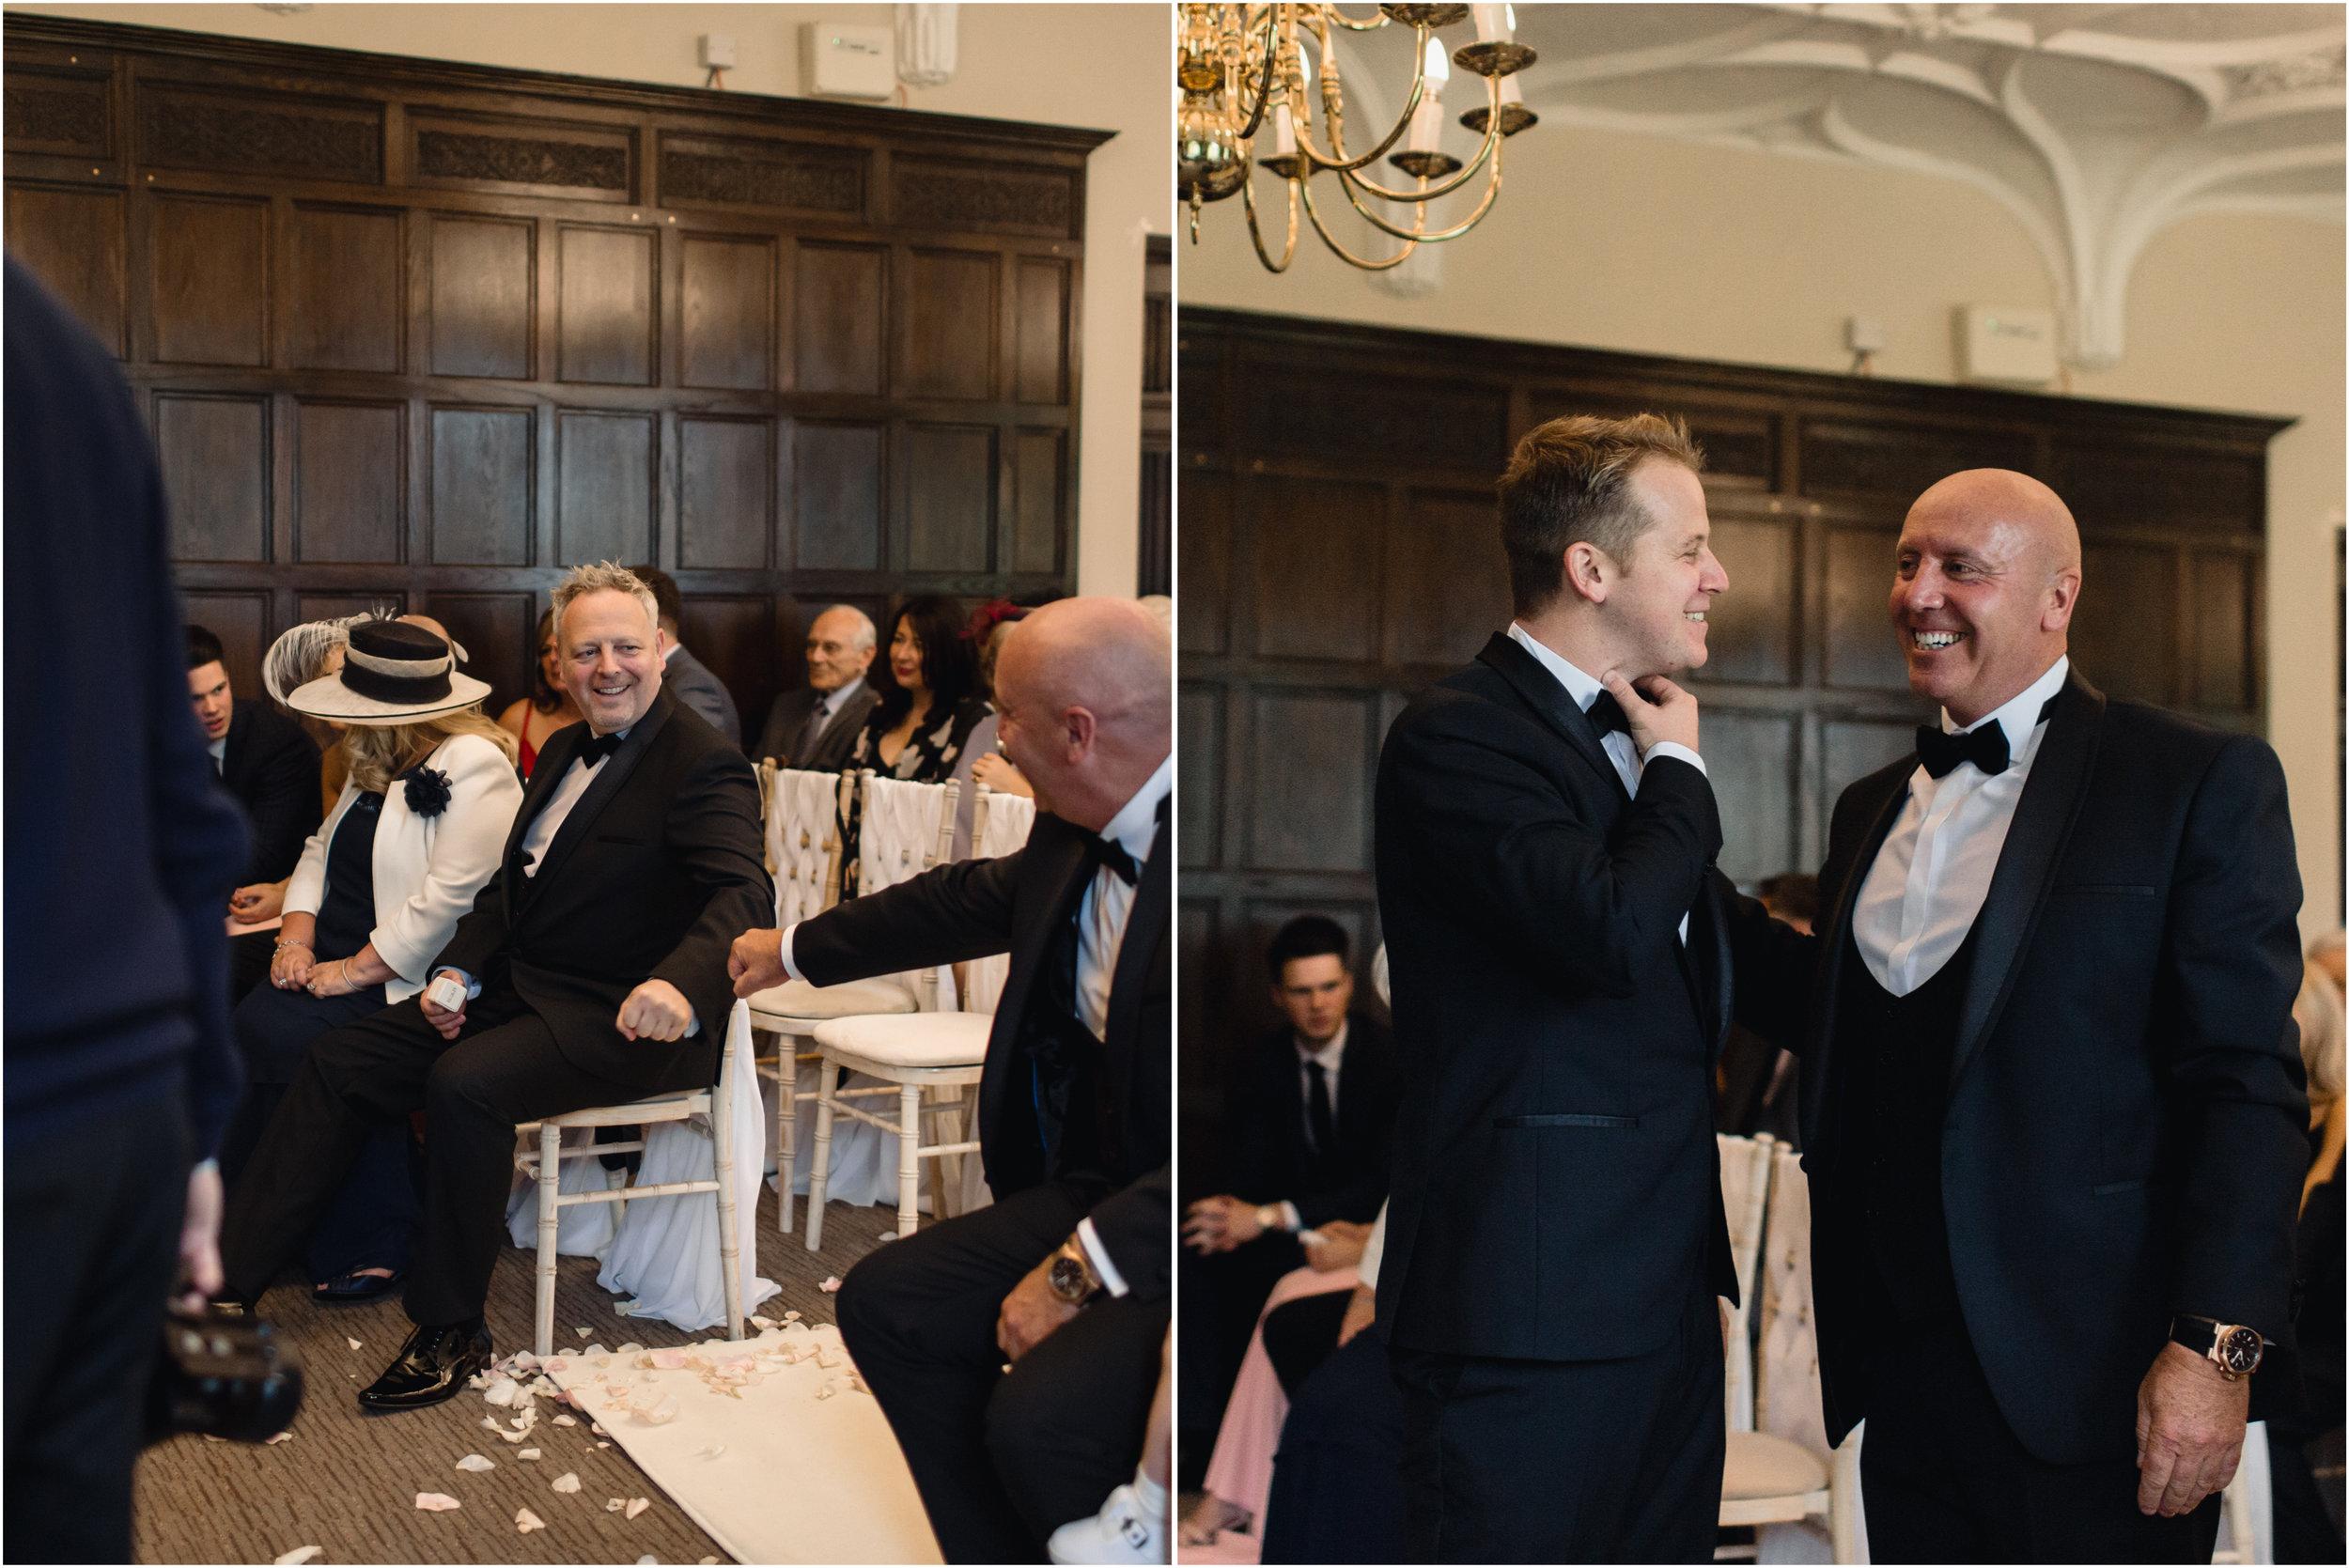 Rebecca Searle Wedding Photography Surrey London Luxury 43.jpg